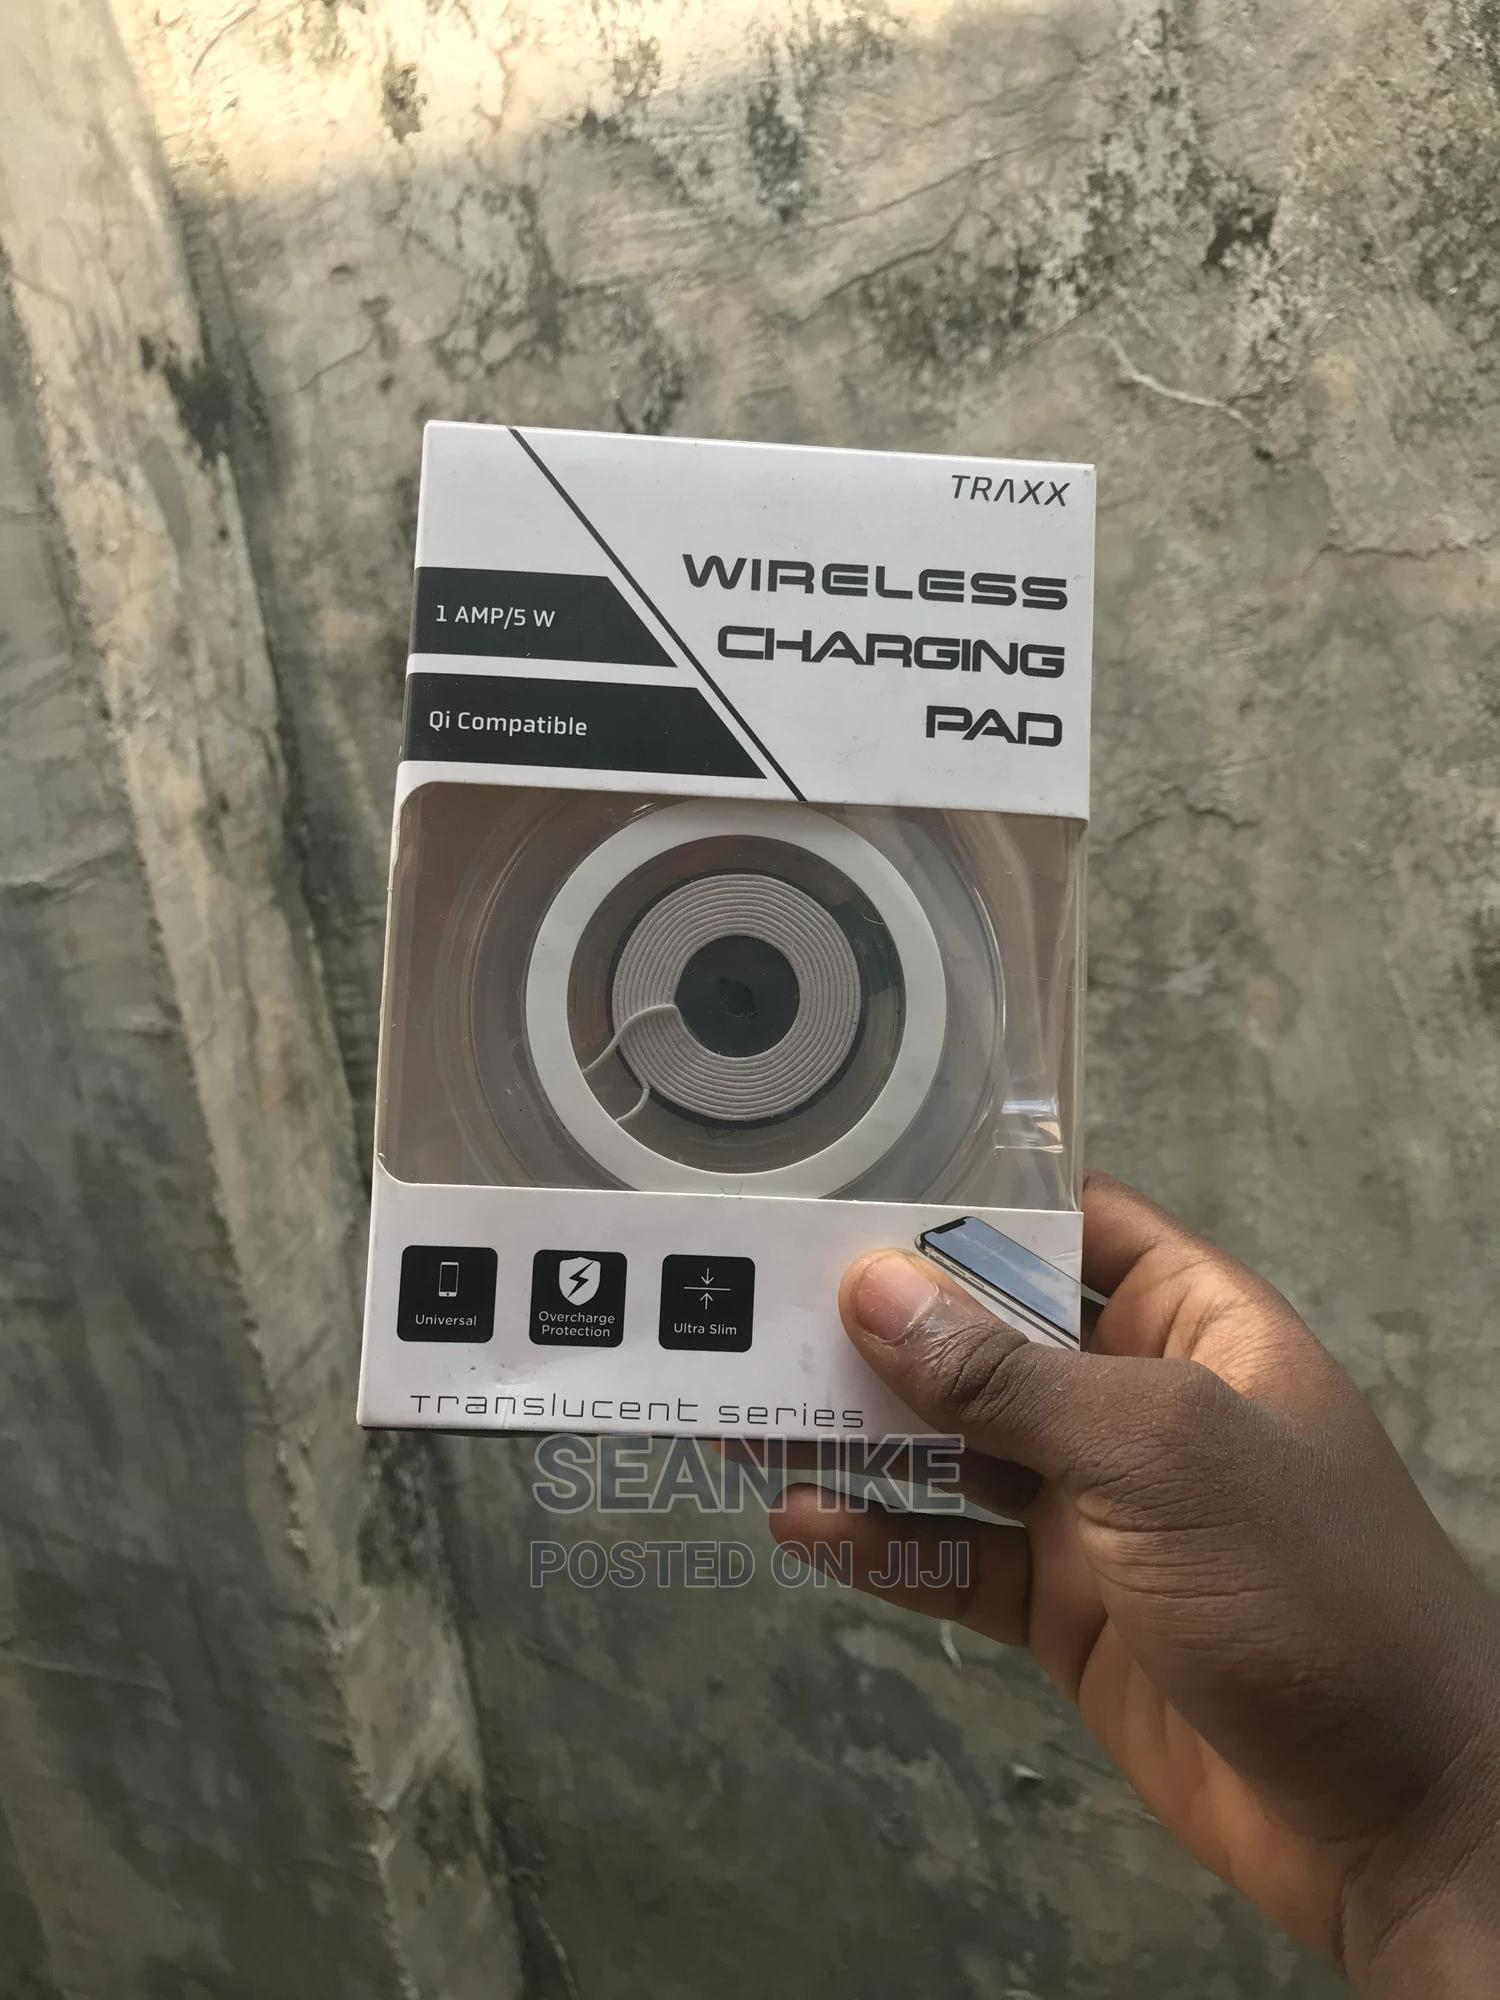 Universal Wireless Charging Pad